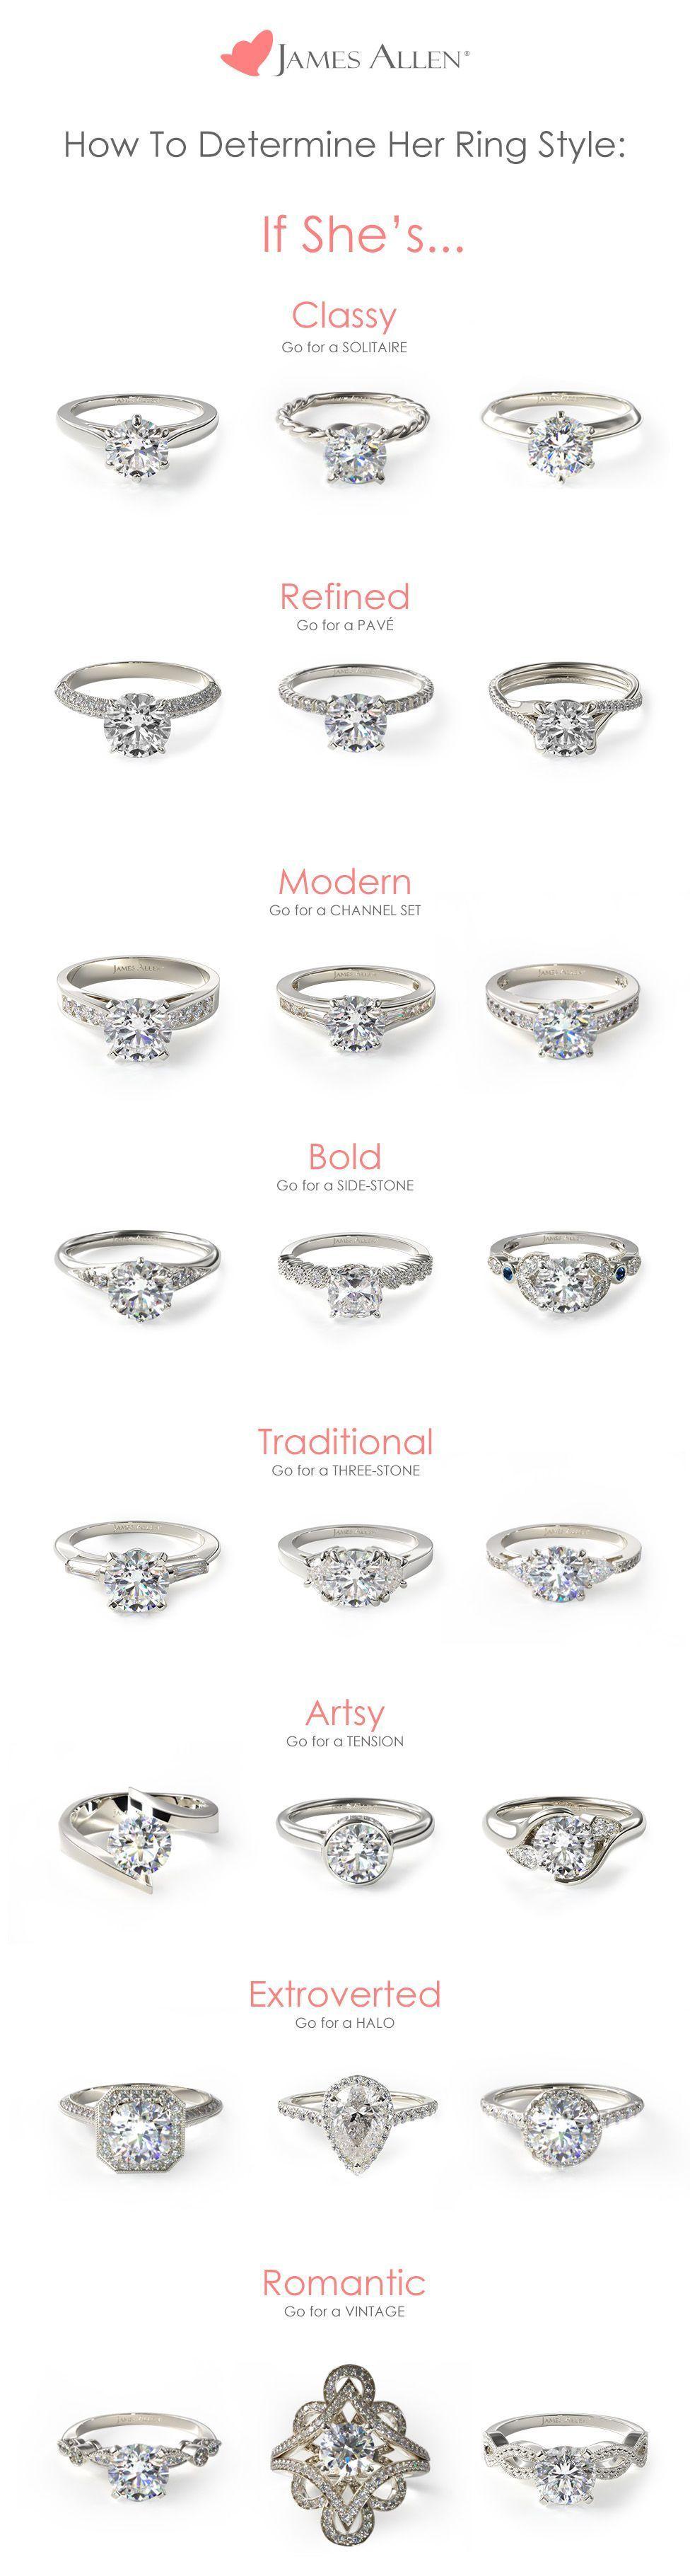 Trending Plus Size Fashion By Kotytostylelab On Etsy Etsy Fashion Kotytostylelab Dream Engagement Rings Designer Engagement Rings Wedding Rings Engagement